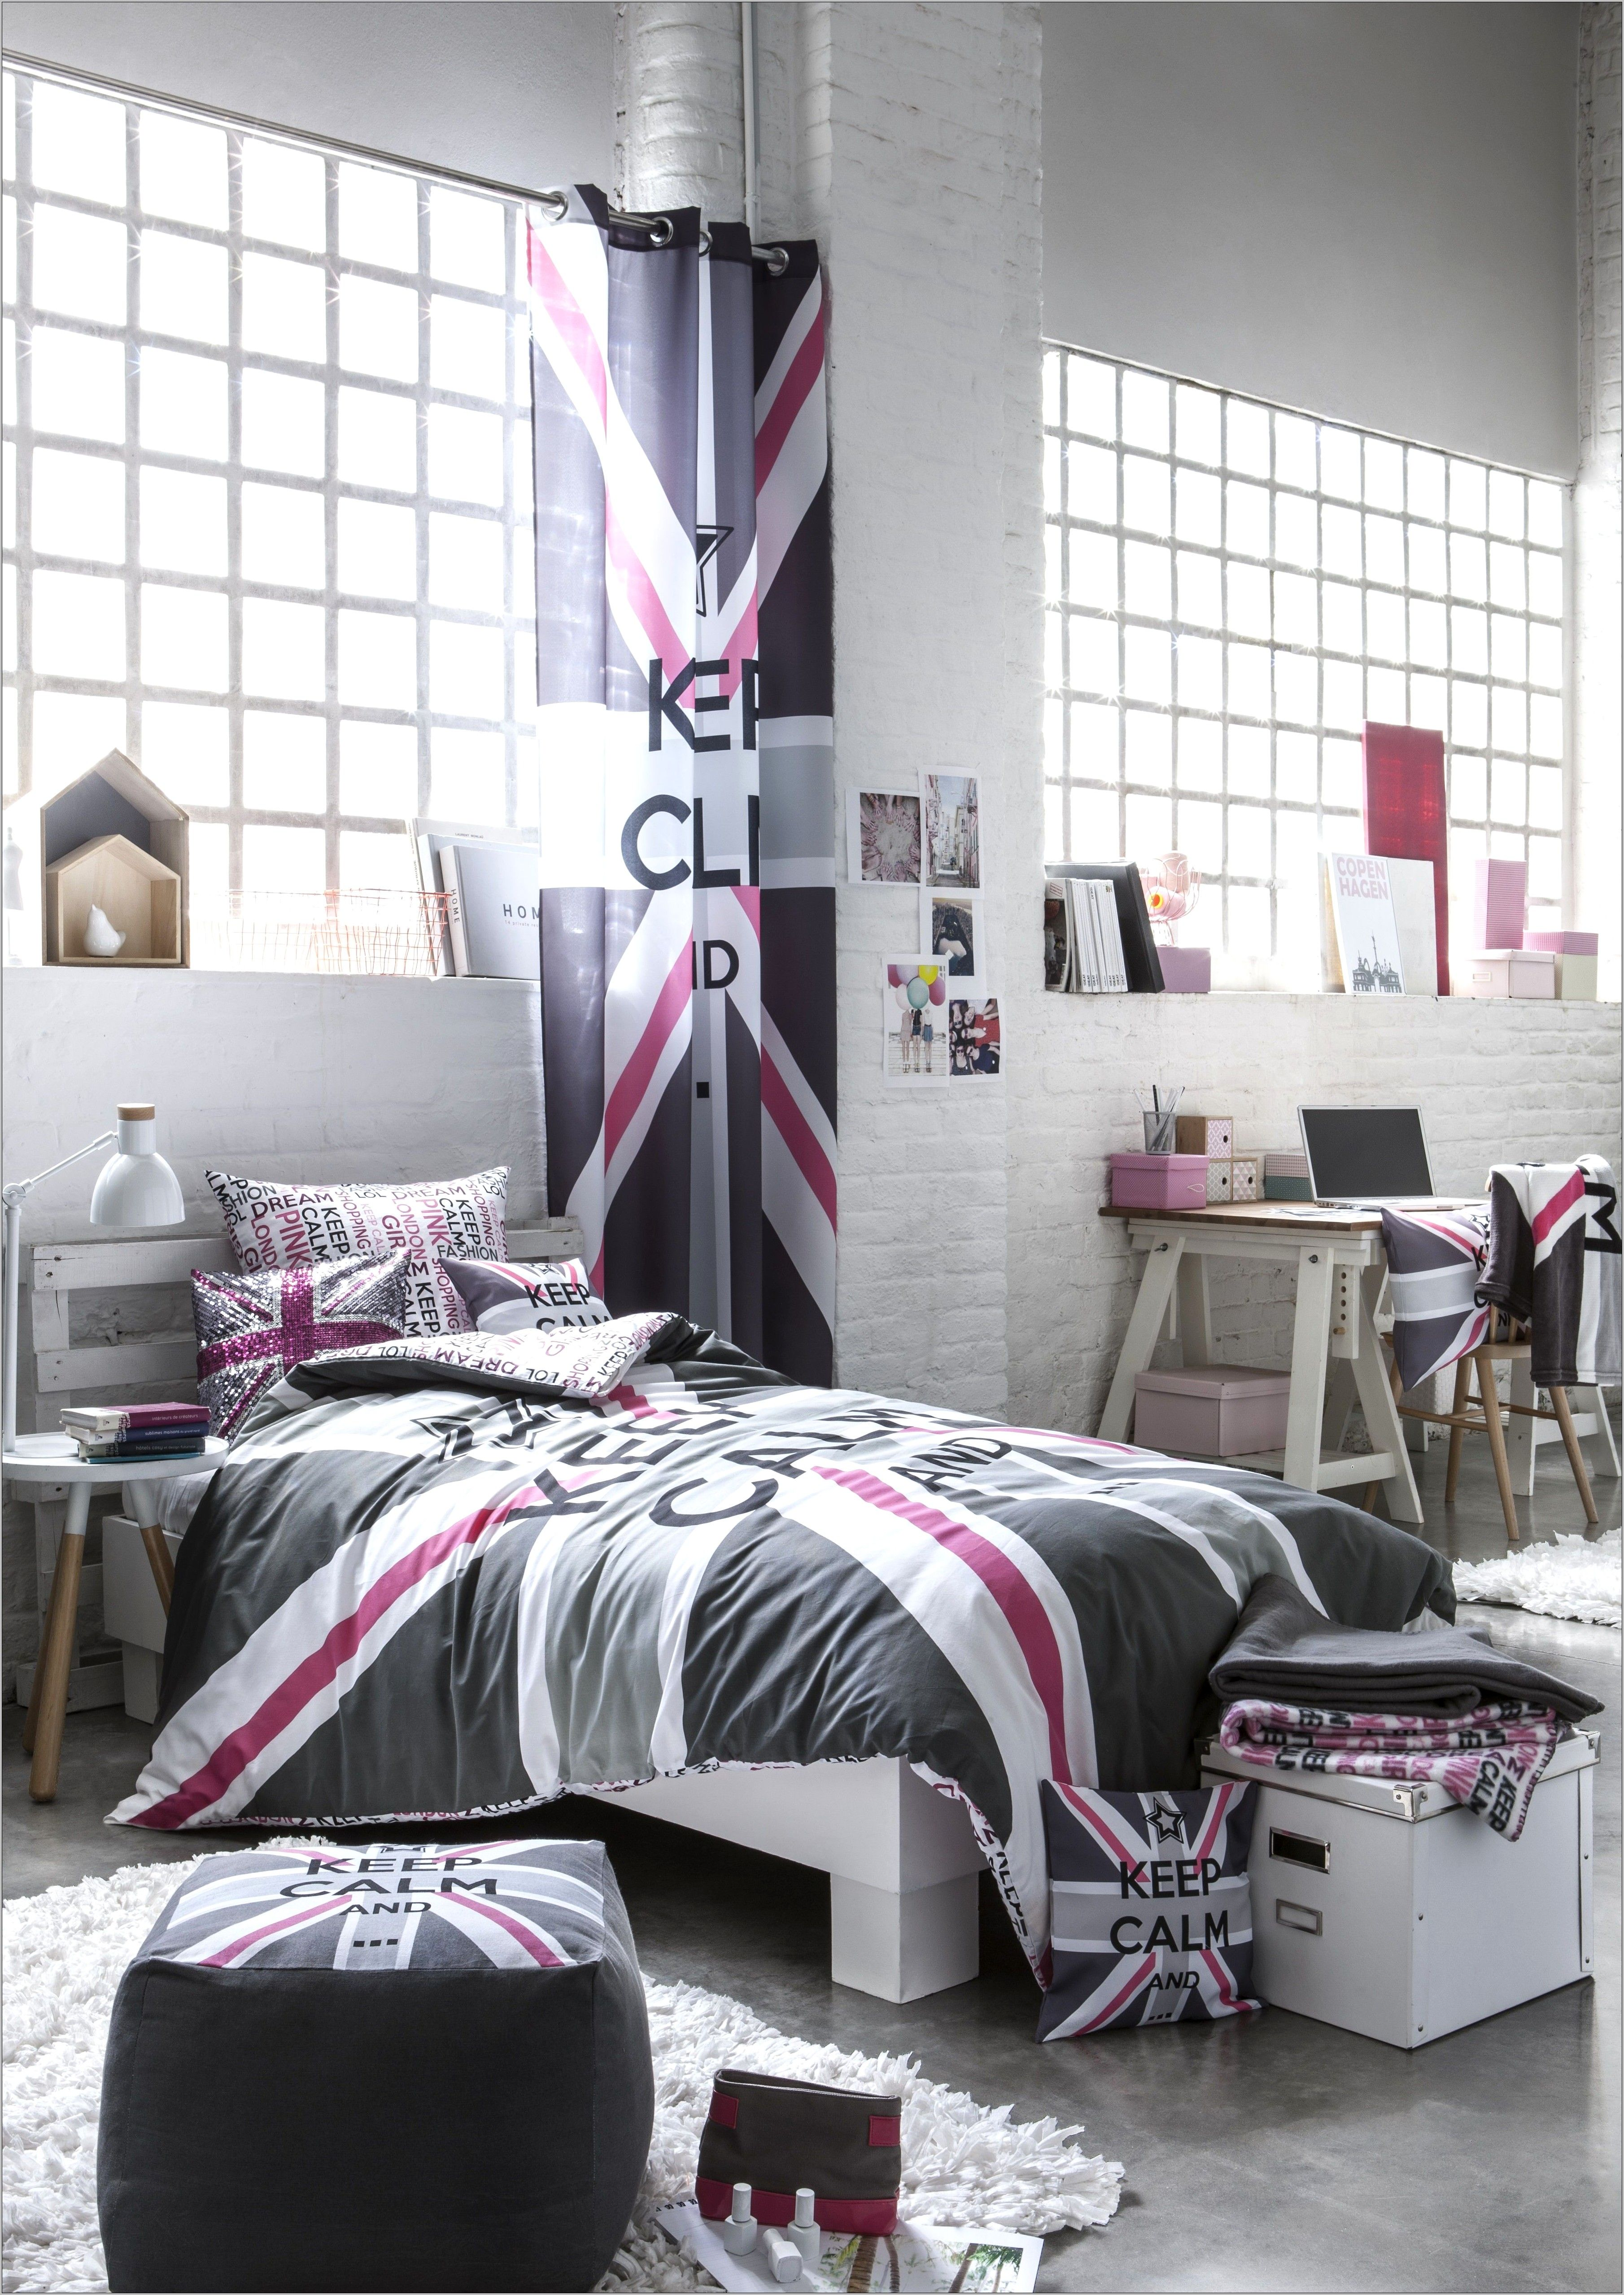 Chambre Mur Rose Deco London Fille En 2020 Deco Chambre Idee